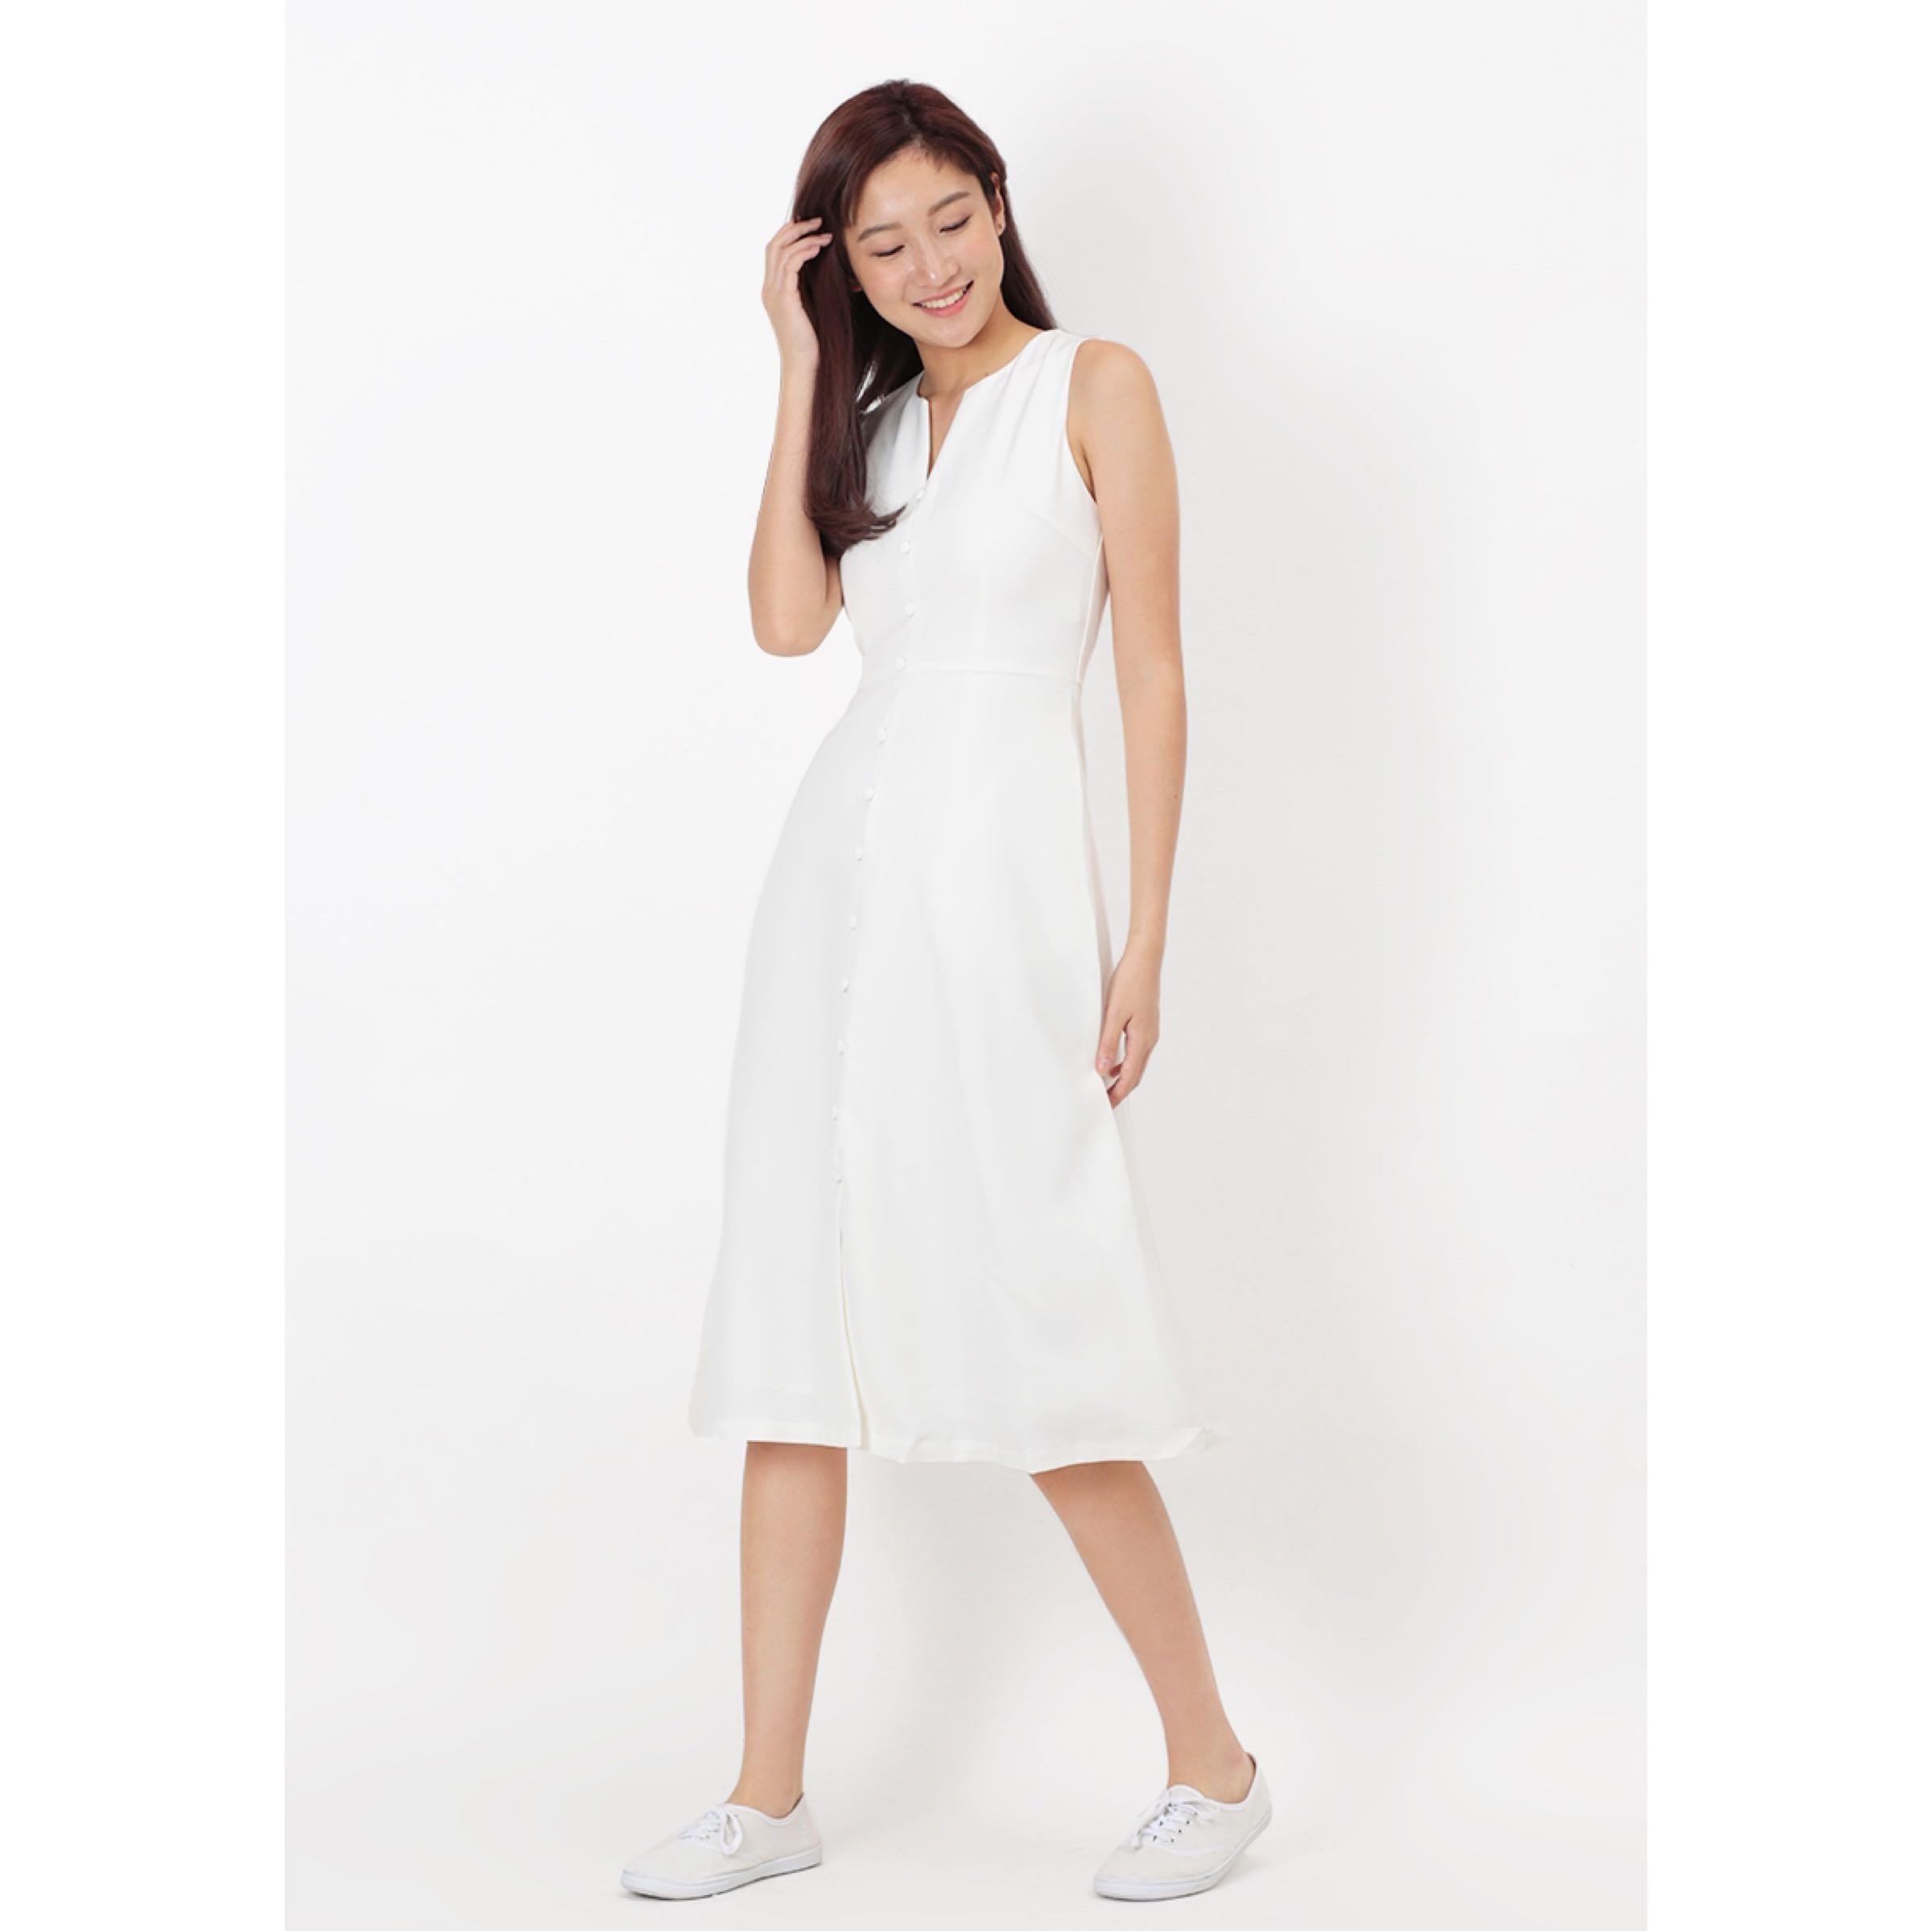 73691a774ded21 BNWT AFA Lillie Button Midi Dress in White (Size XS), Women's ...